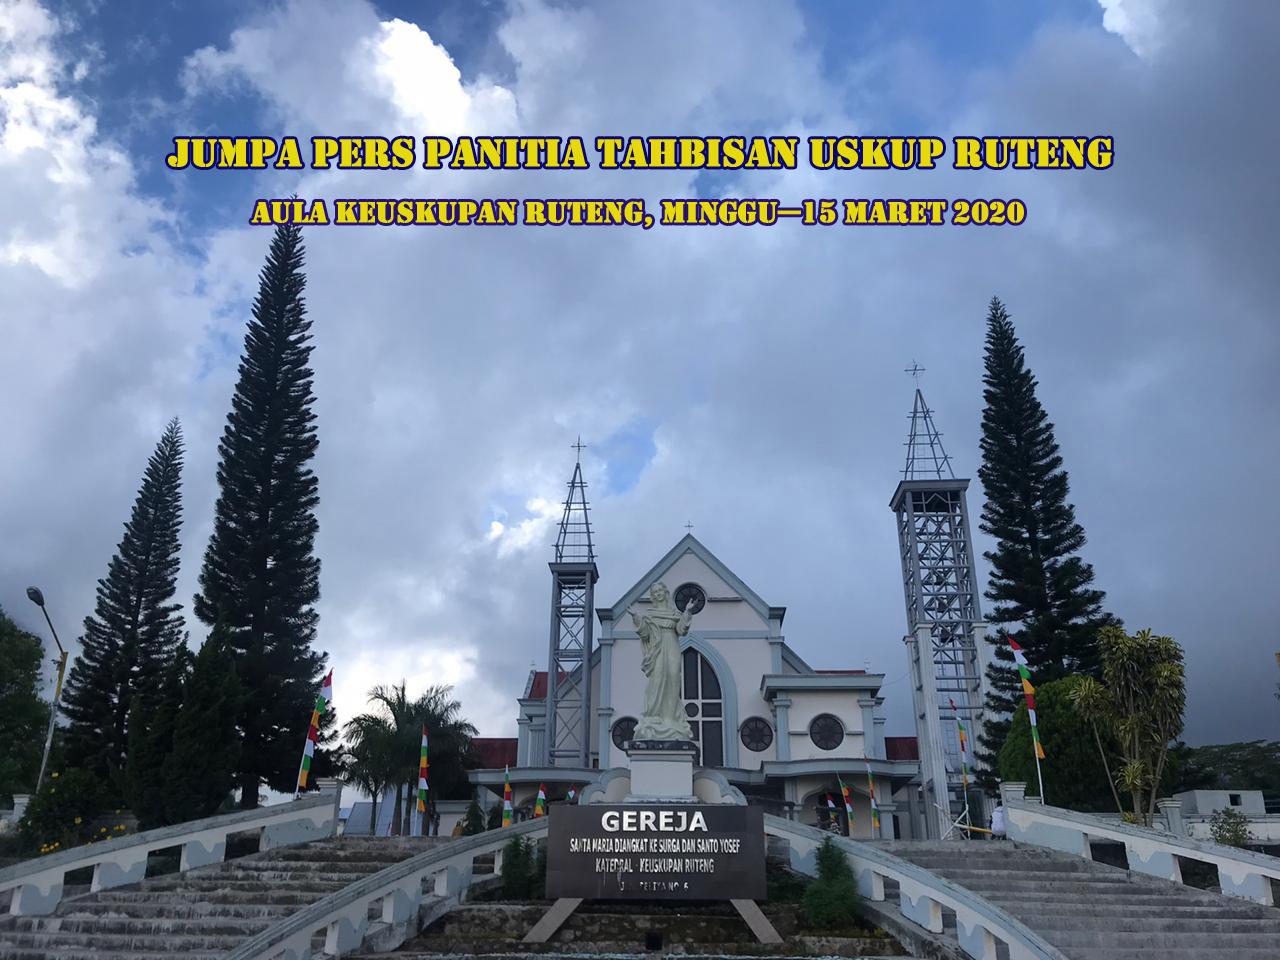 Keuskupan Ruteng, Tahbisan Uskup Ruteng, Komsos KWI, Konferensi Waligereja Indonesia, Jumpa Pers, Oanitia Tahbisan Uskup Ruteng